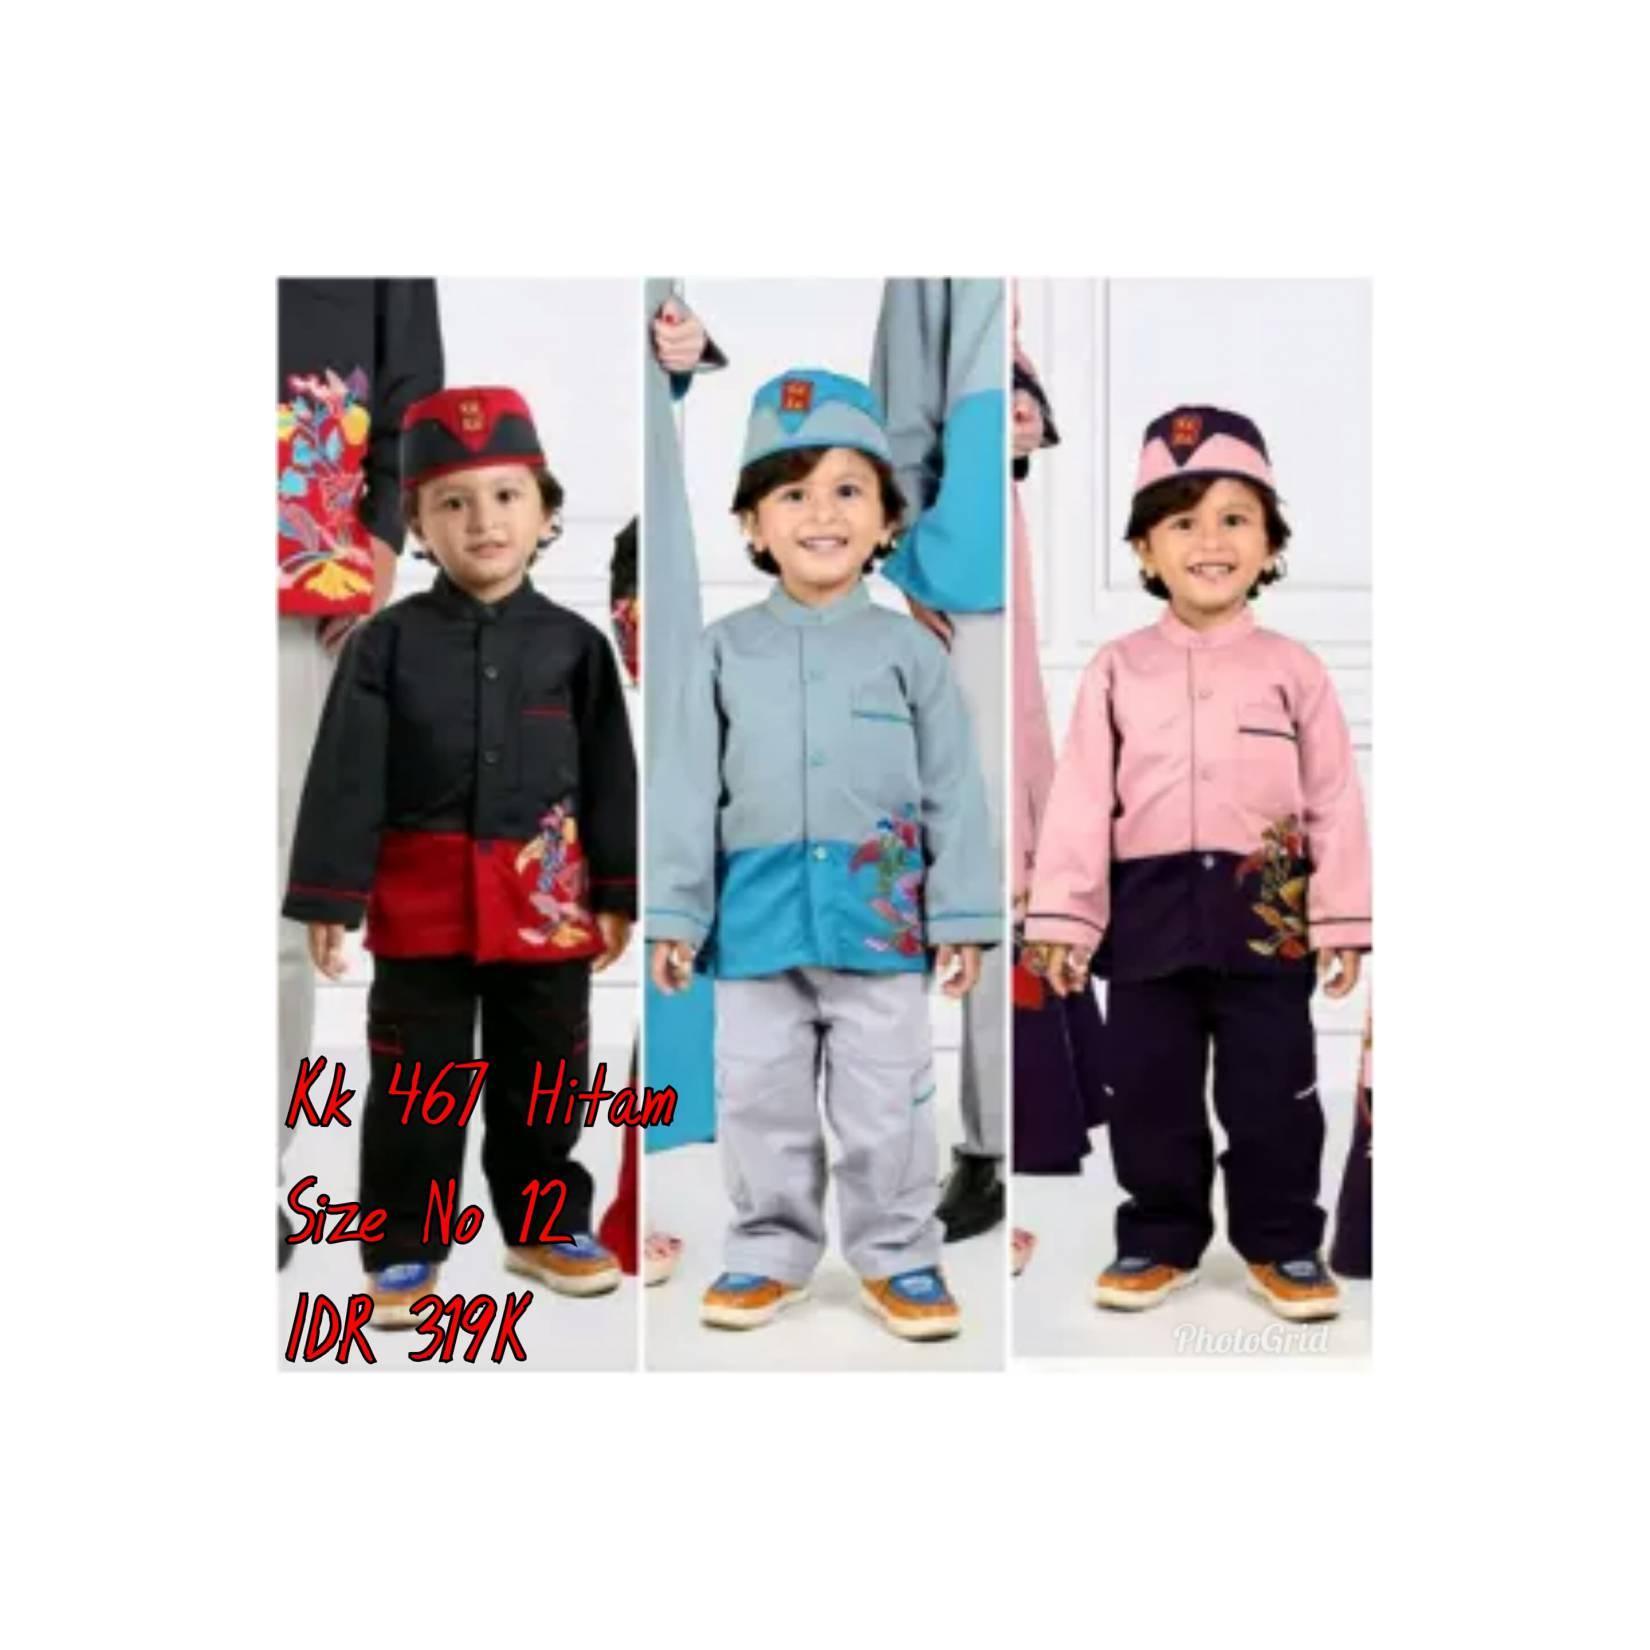 Keke Baju Anak Muslim KK 467 Hitam No12 Diskon / Sale / Obral 25%